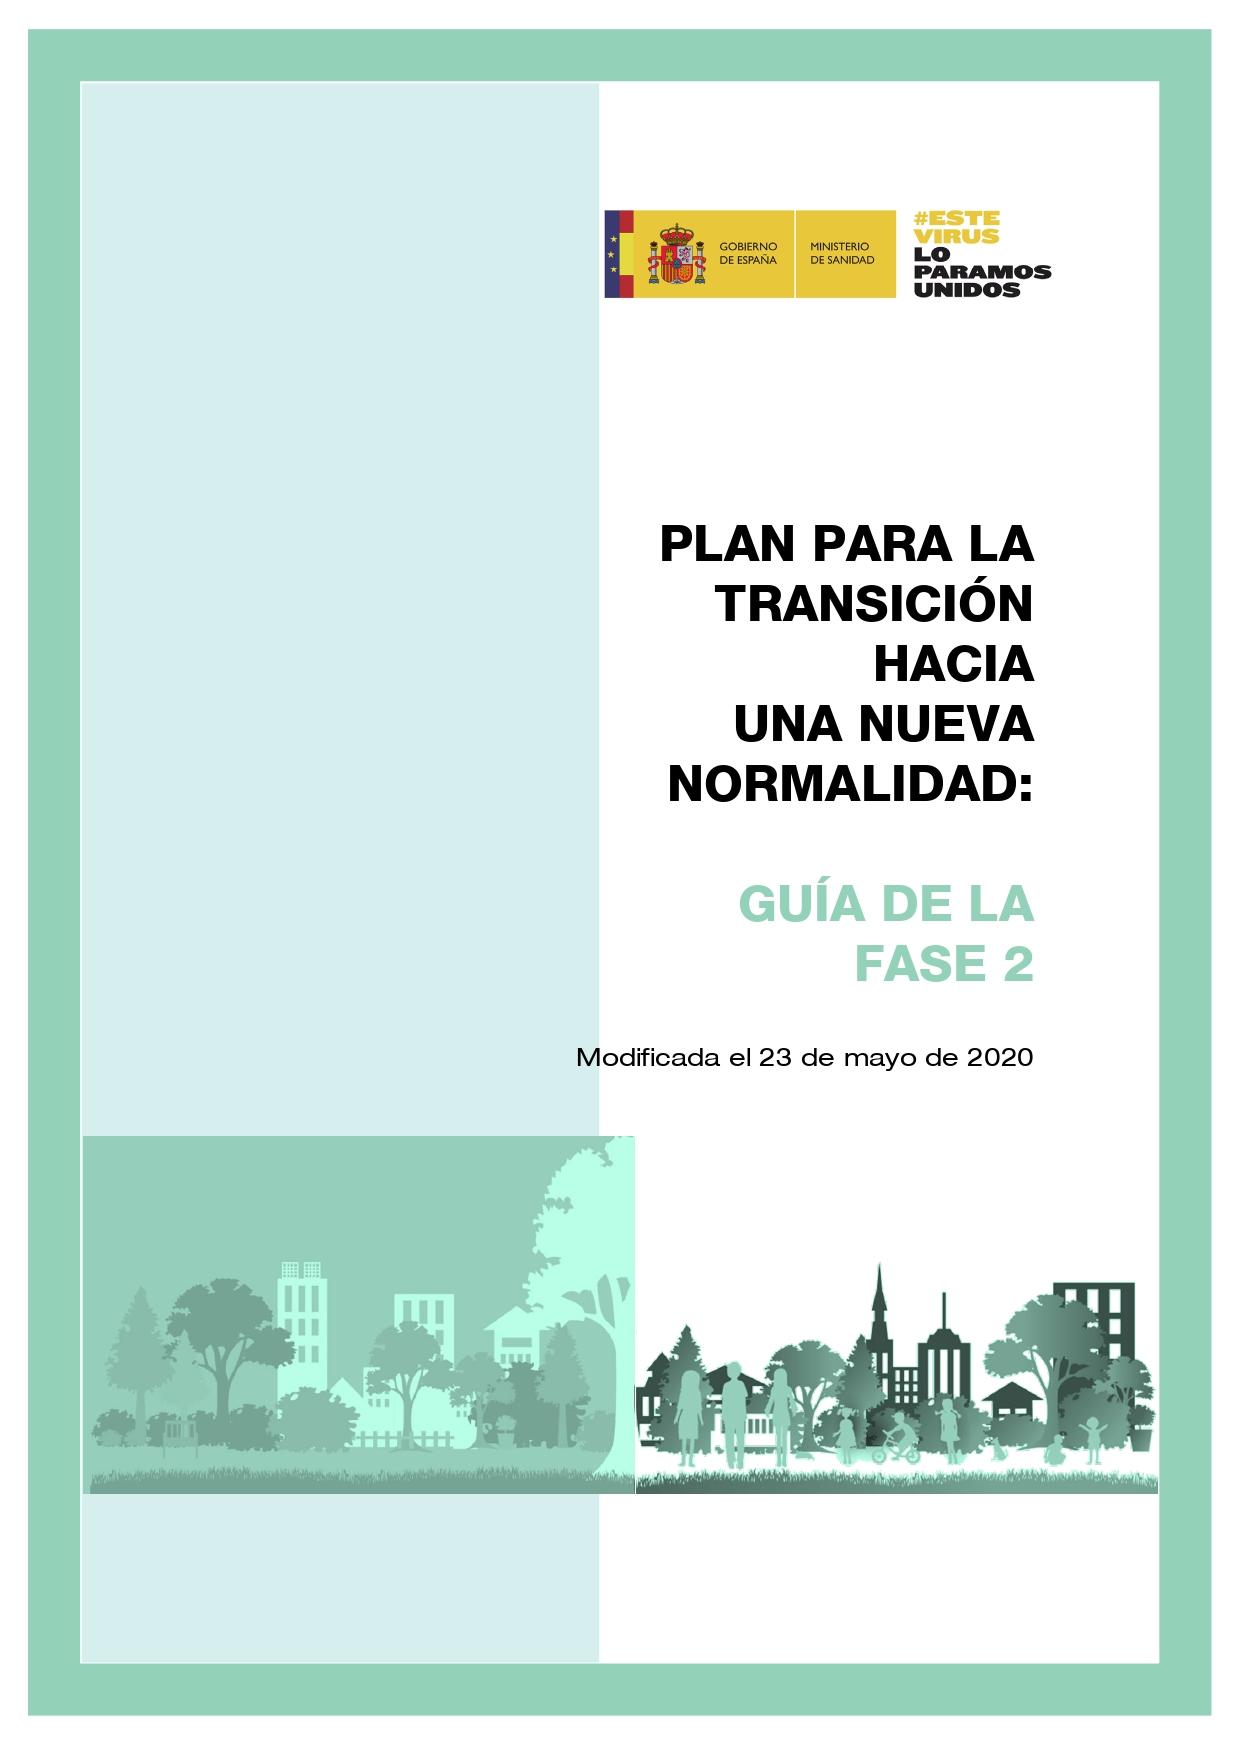 23052020_Plan_Transicion_Guia_Fase2_page-0001